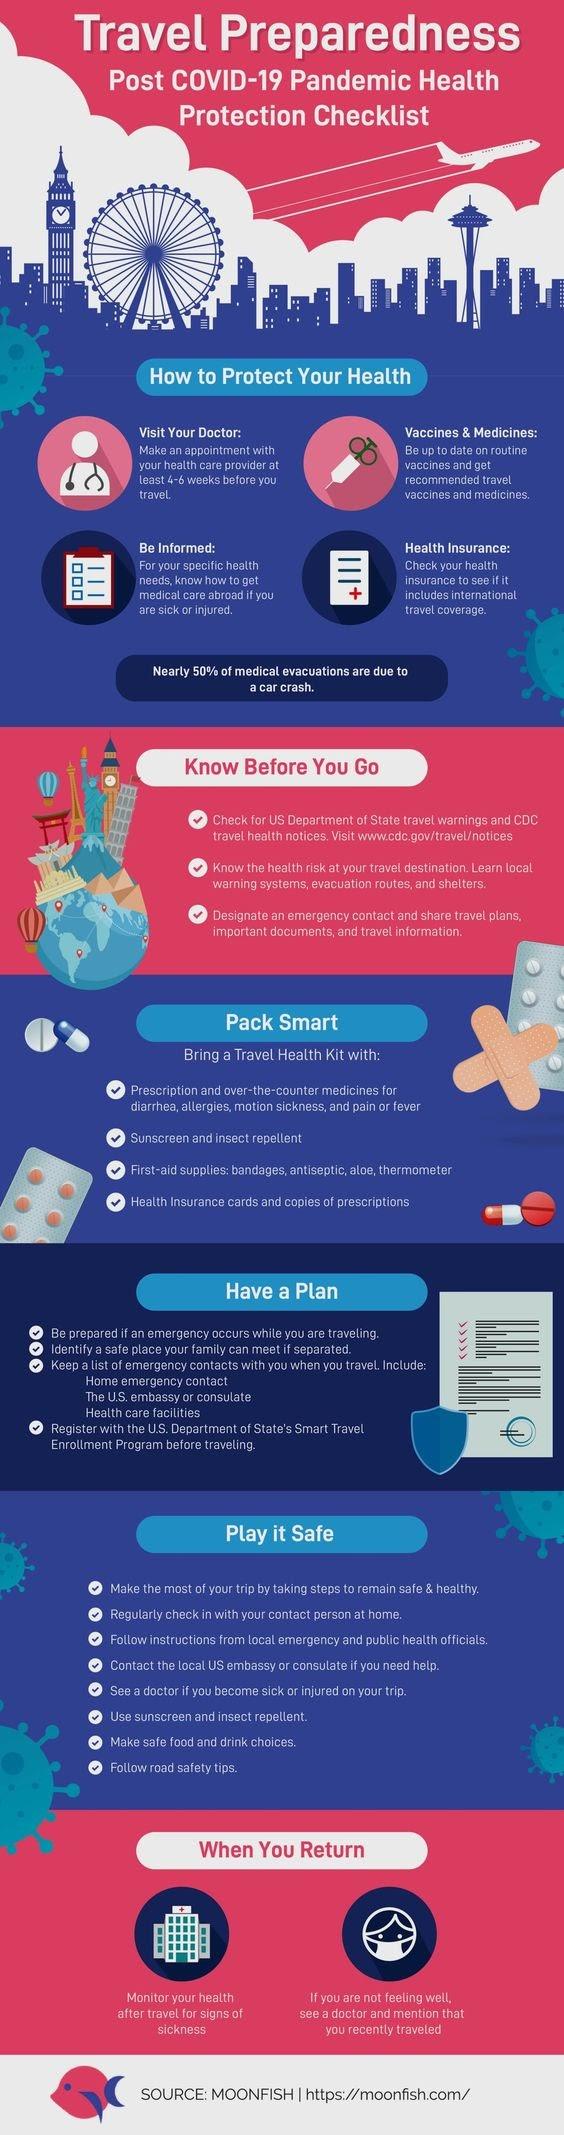 Travel Covid-19 Checklist Update #Infographic